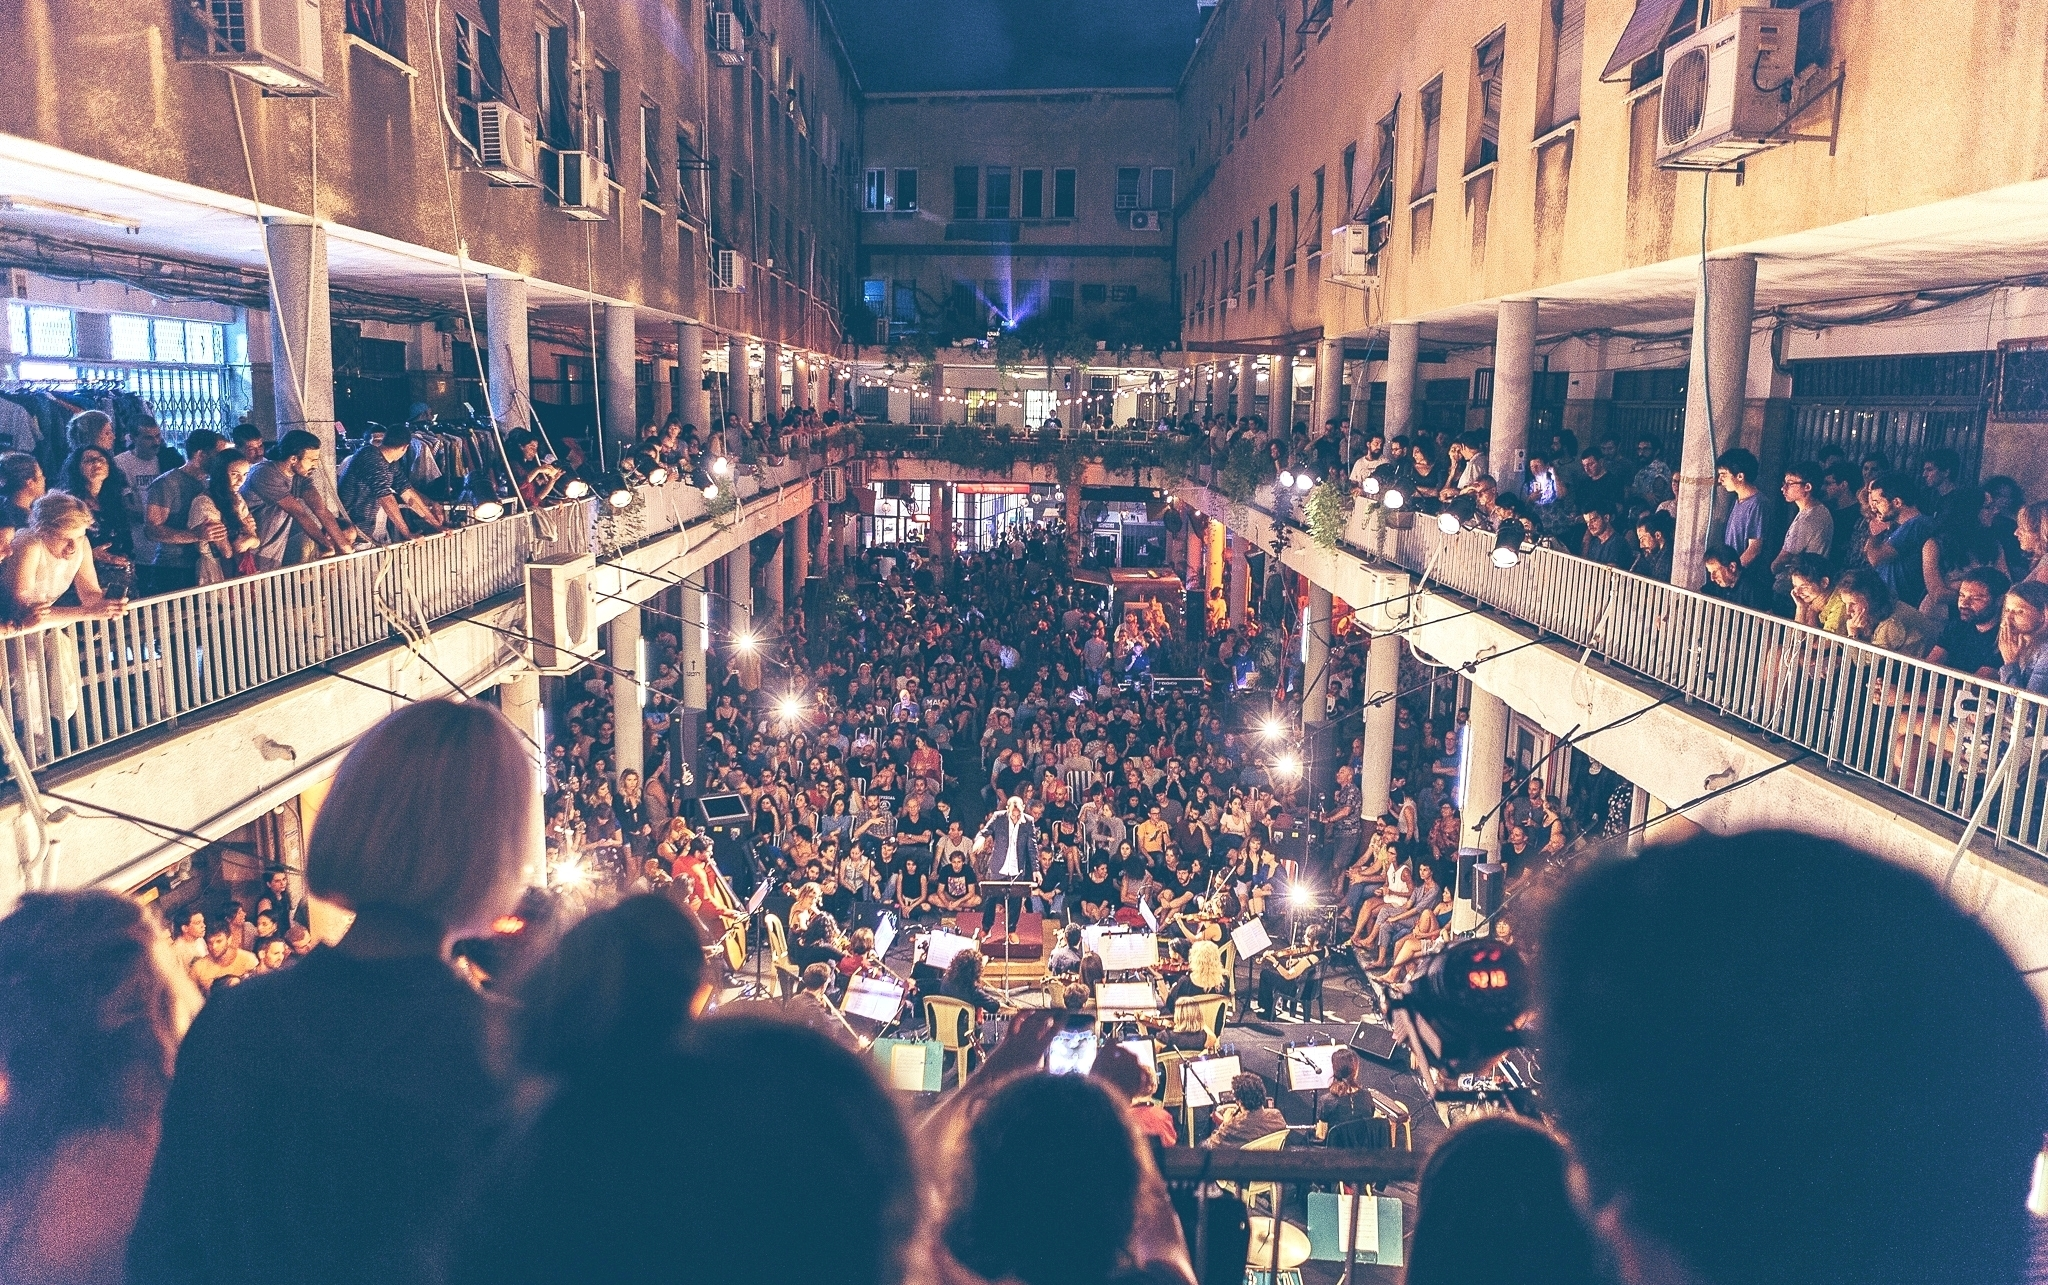 The best venues in the Tel Aviv nightlife scene to hear live music